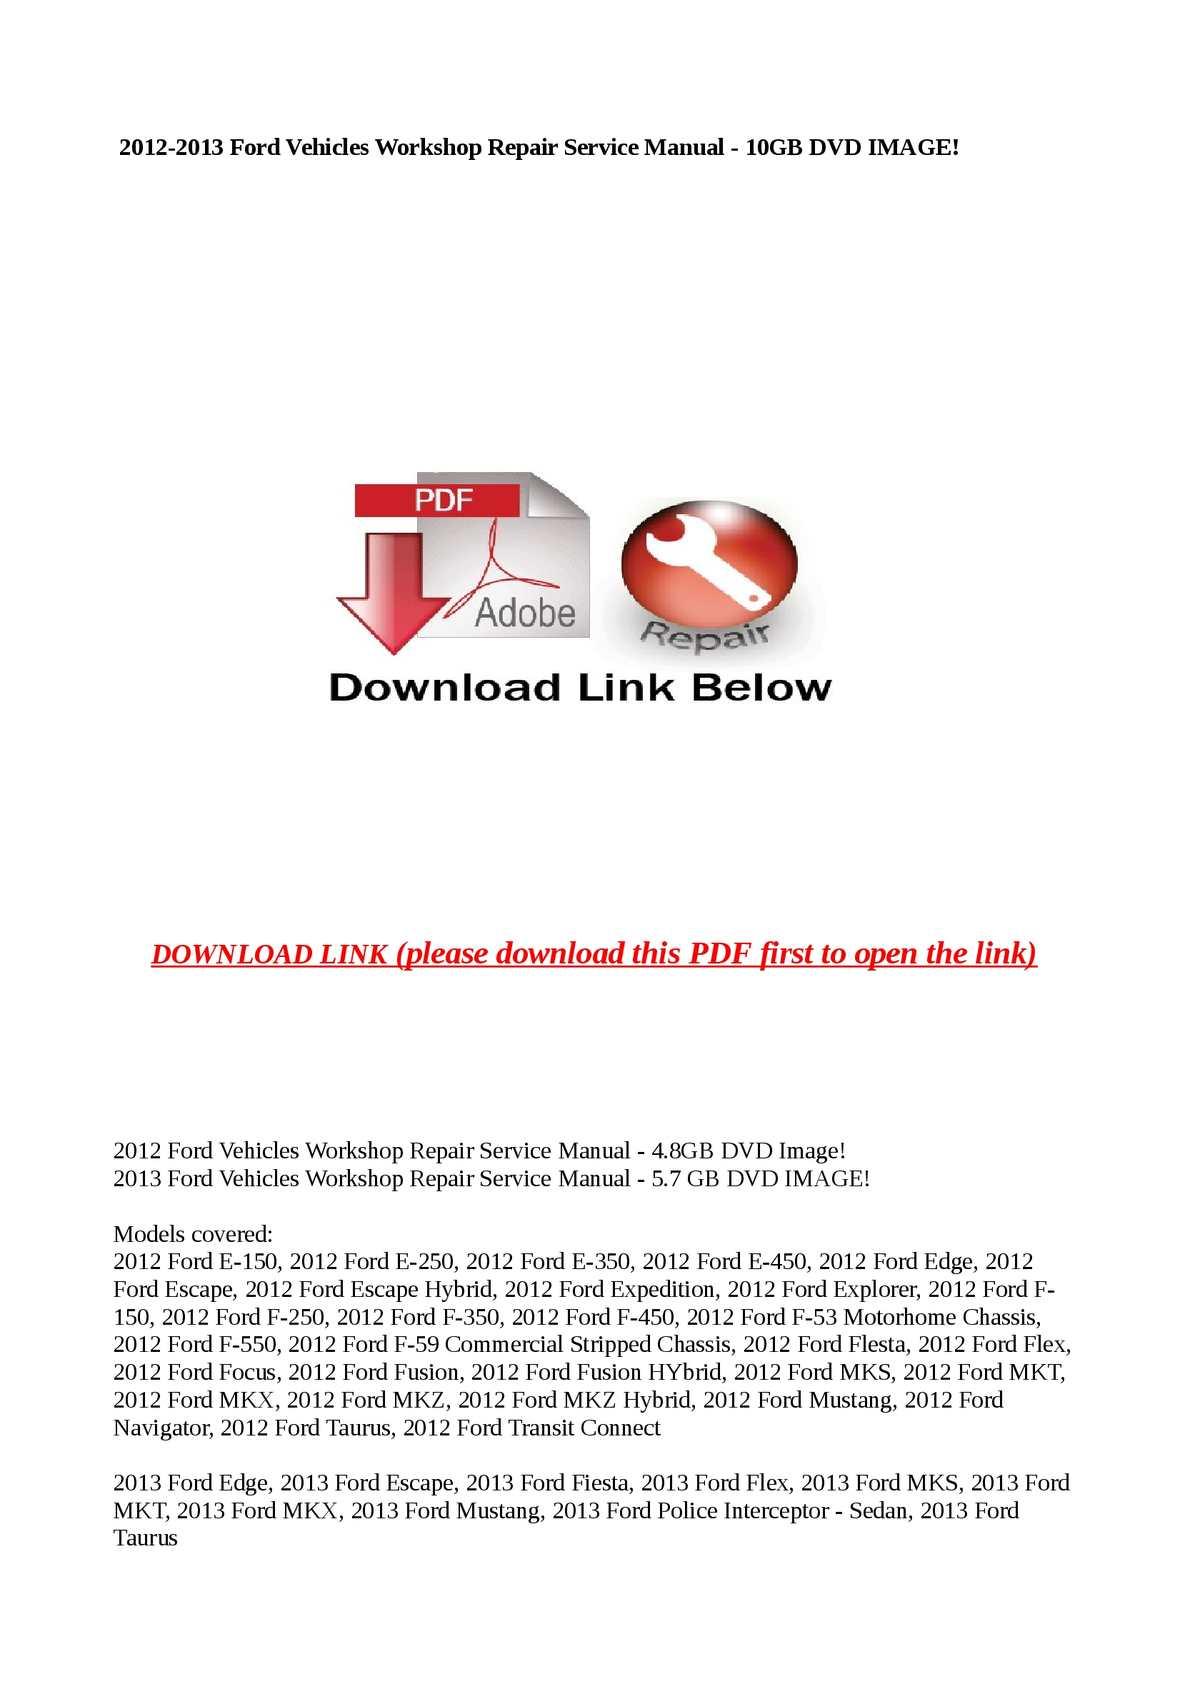 2012 ford vehicles workshop repair service manual 4 8gb dvd image